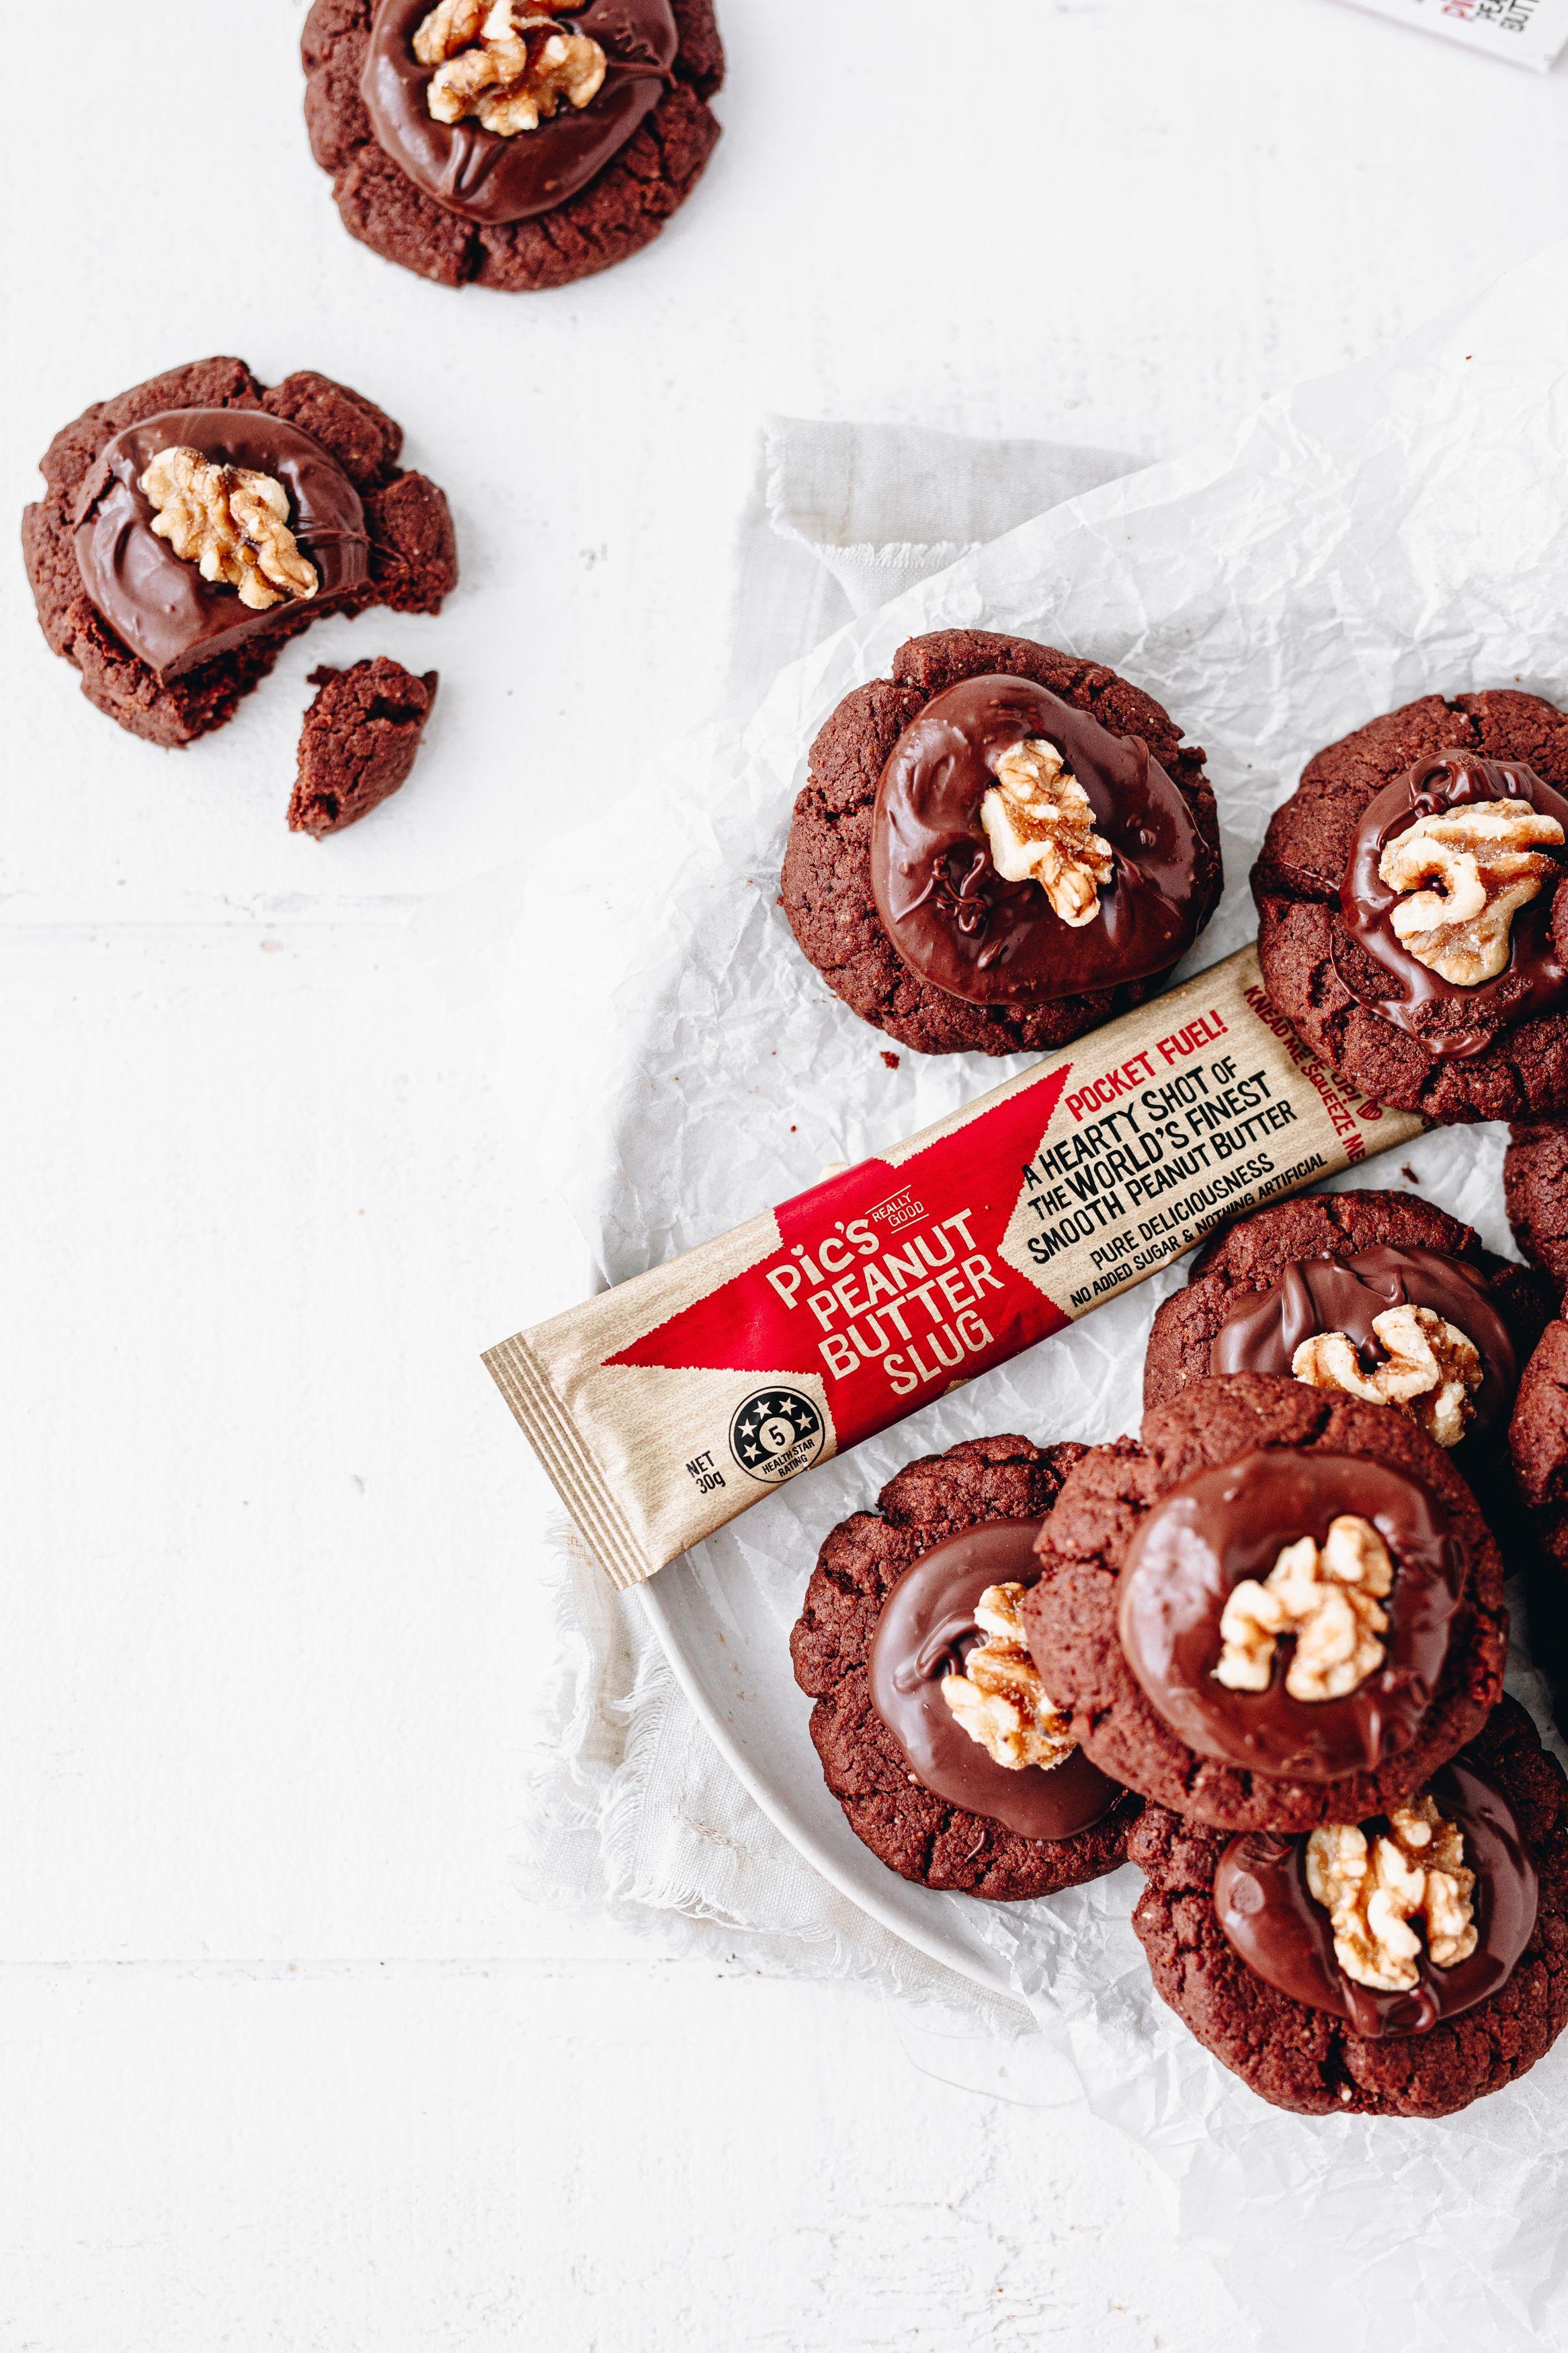 Choc peanut butter afghan biscuits in 2020 sugar free